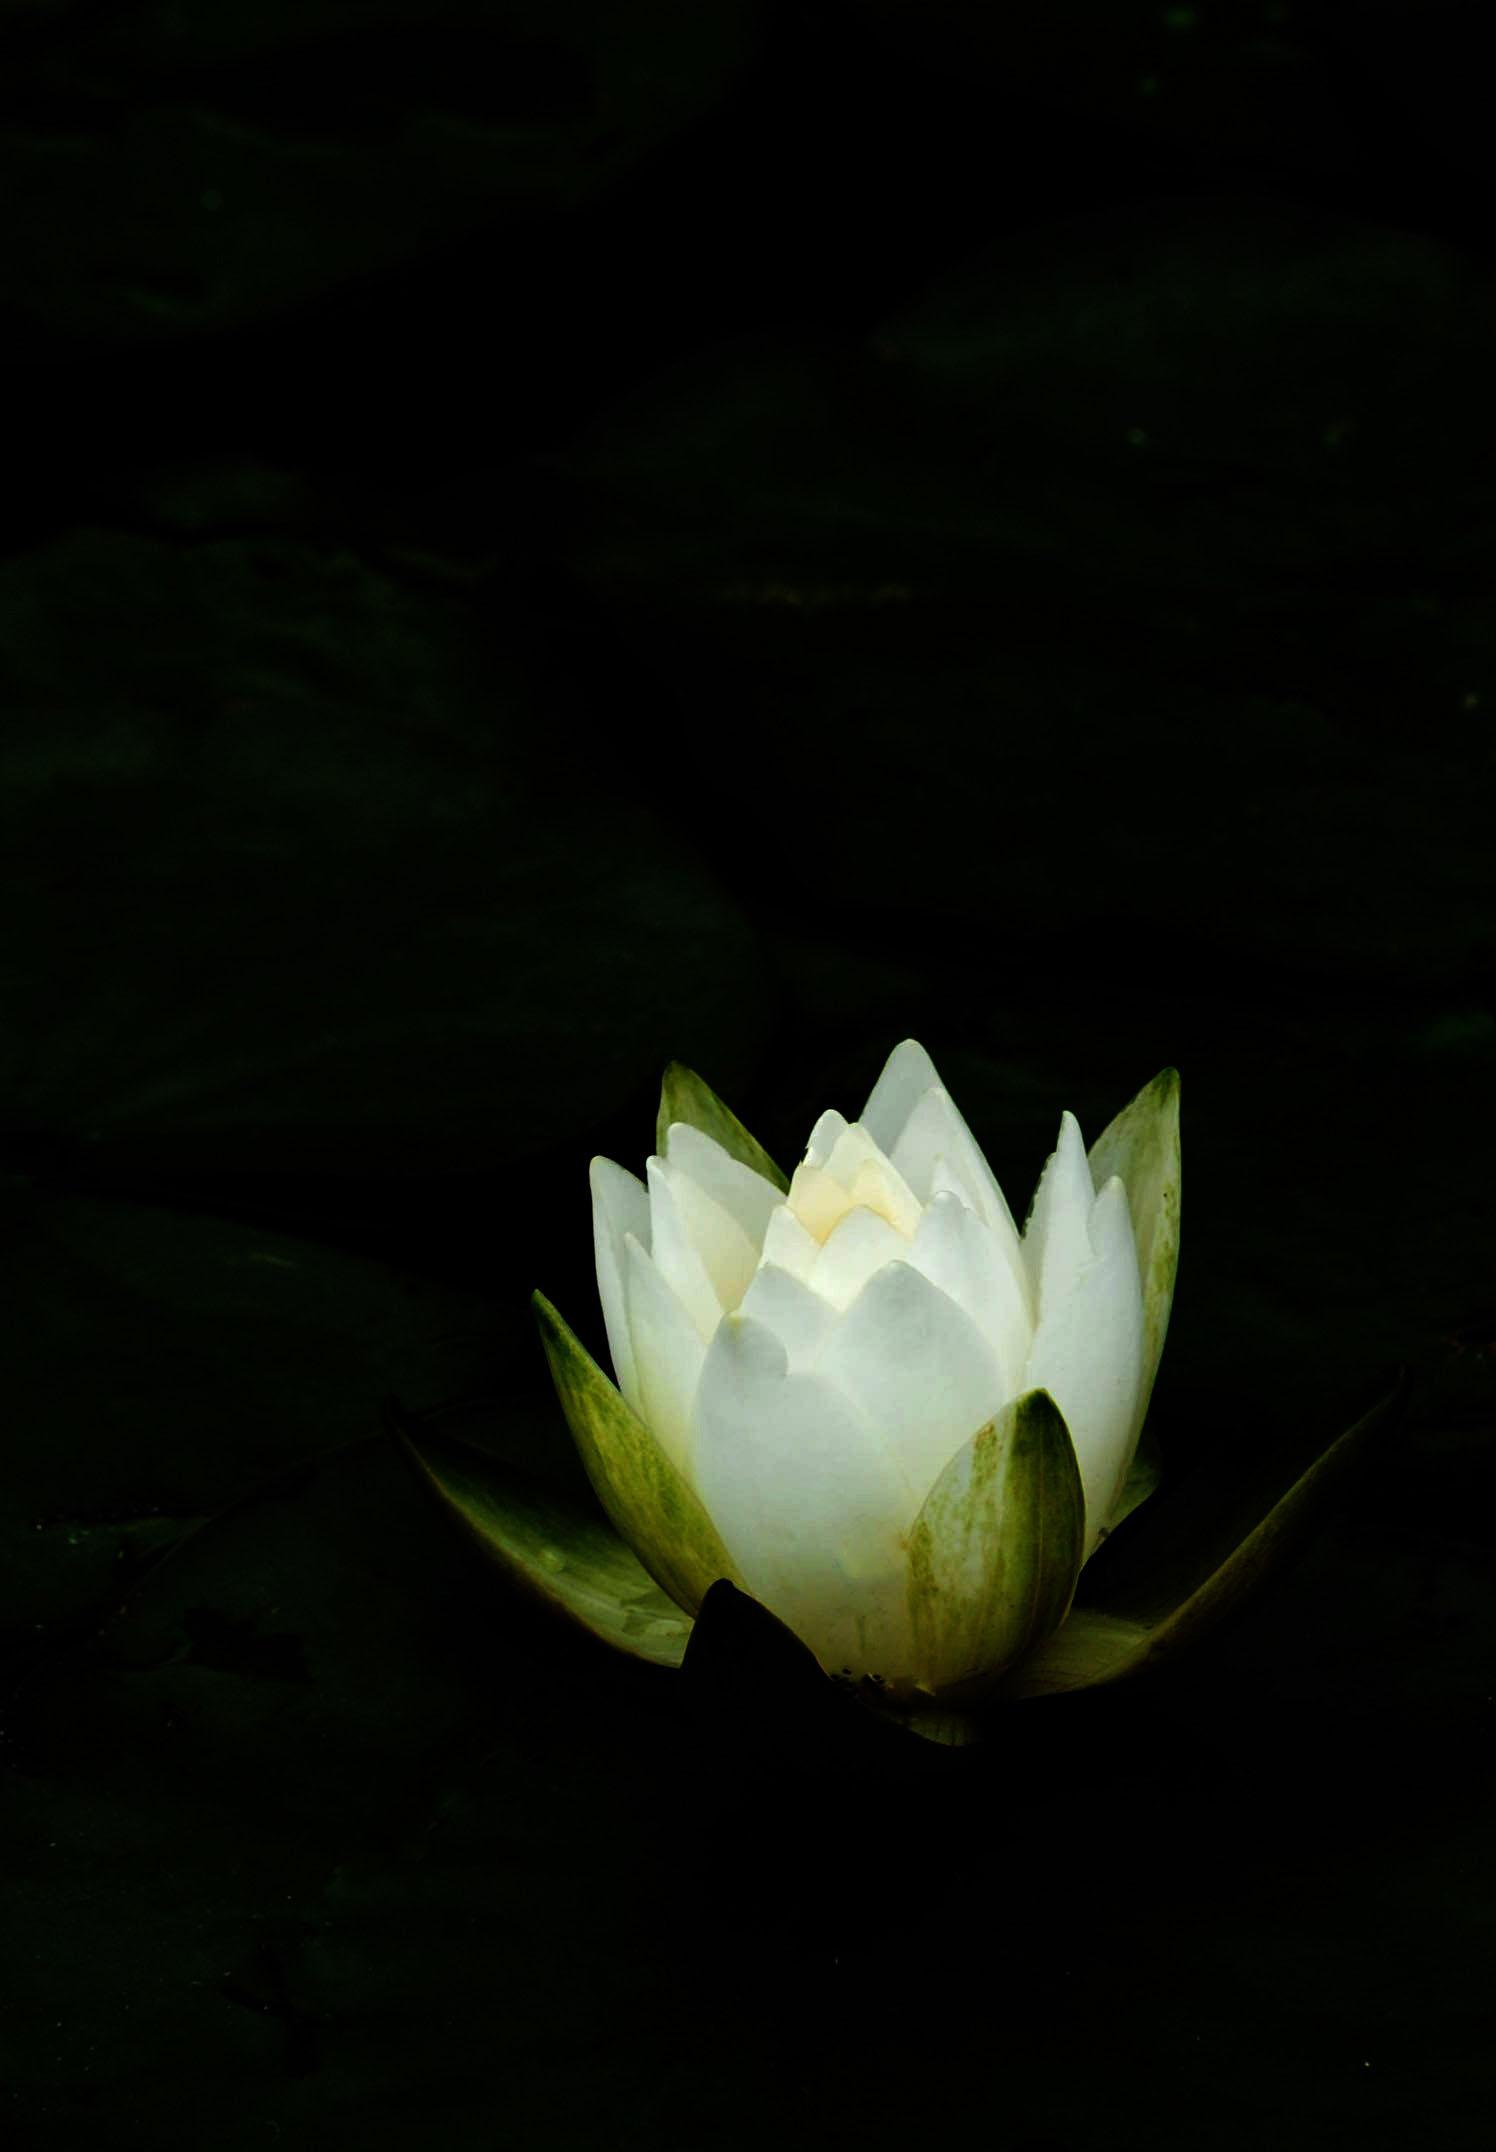 Lily Pad Flower.jpg